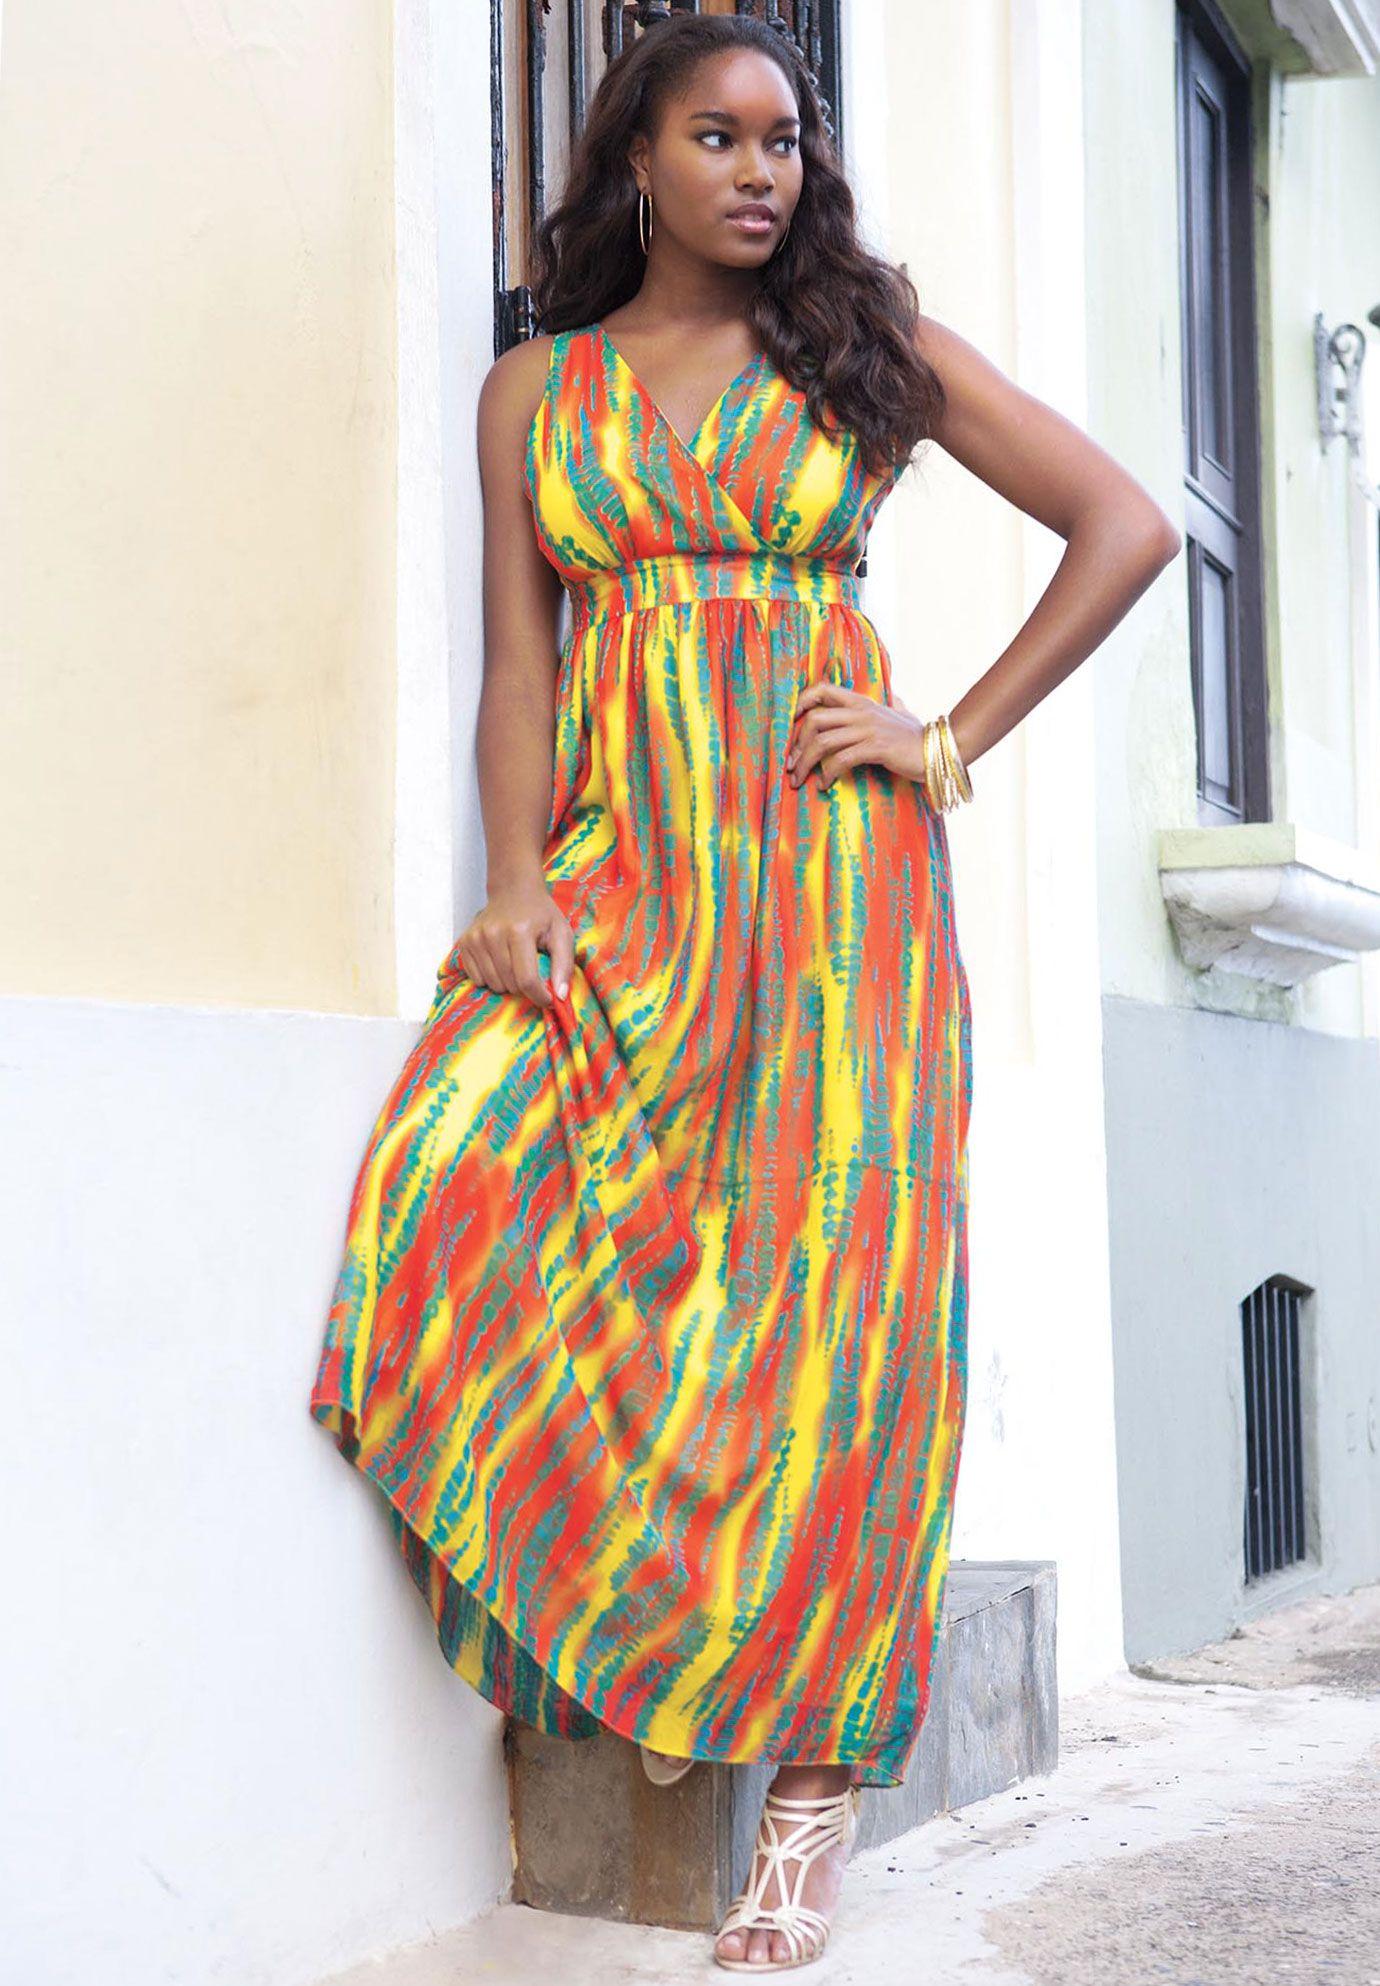 plus size sun dresses the long and short of plus size summer dress trends qqjqbju